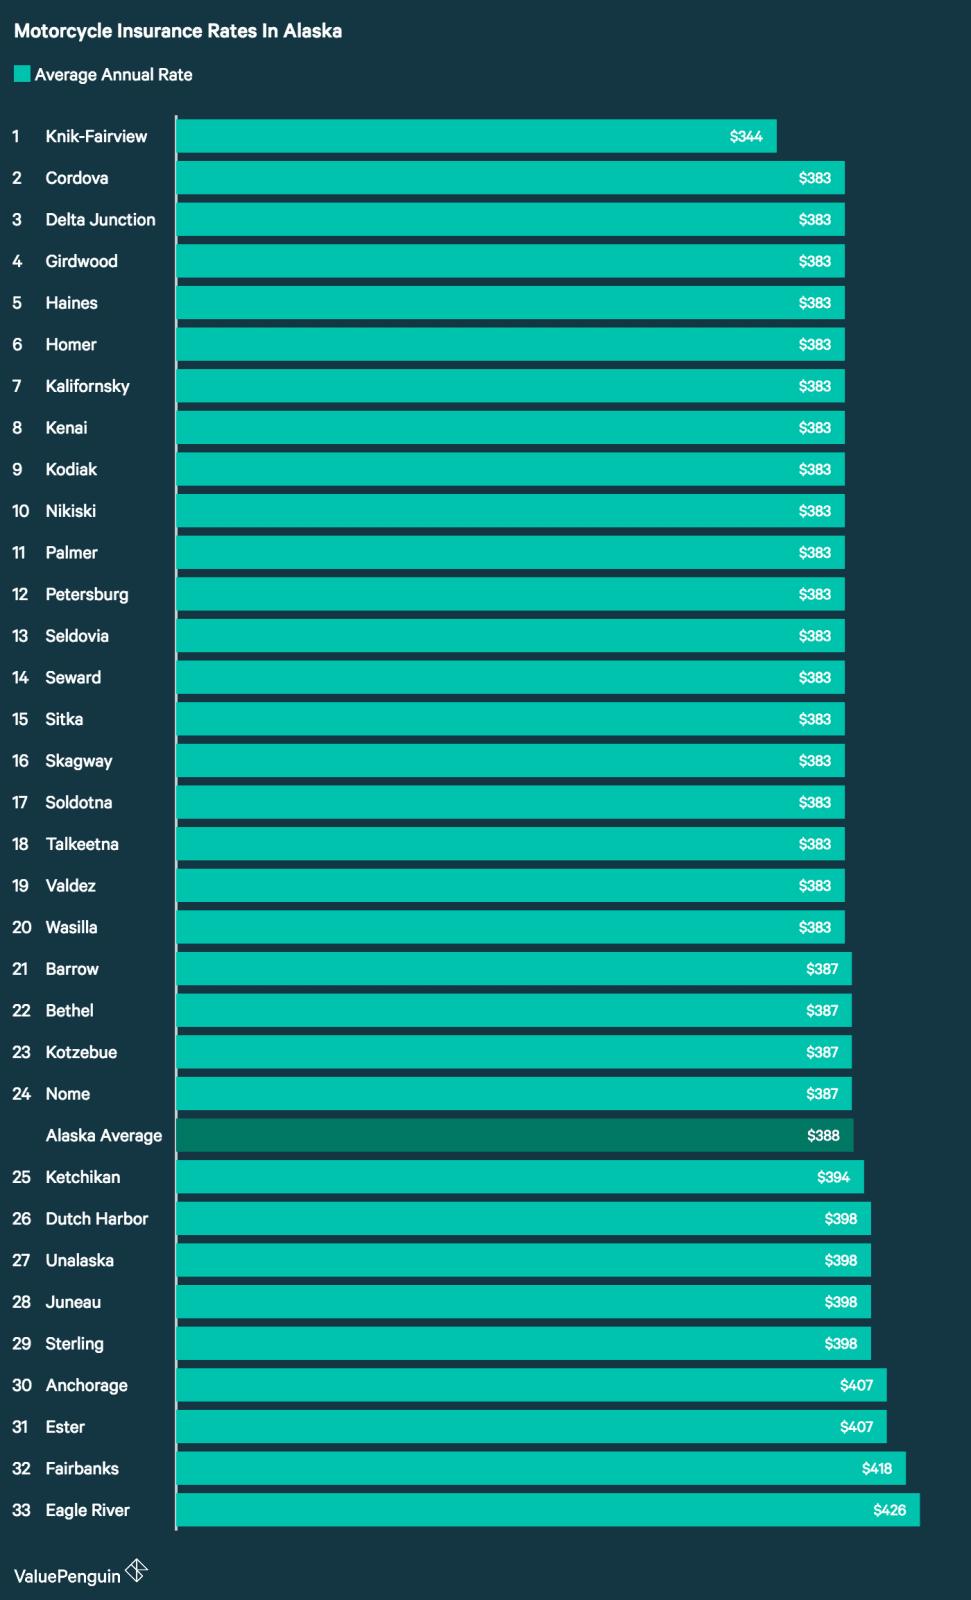 Motorcycle Insurance Rates in Alaska